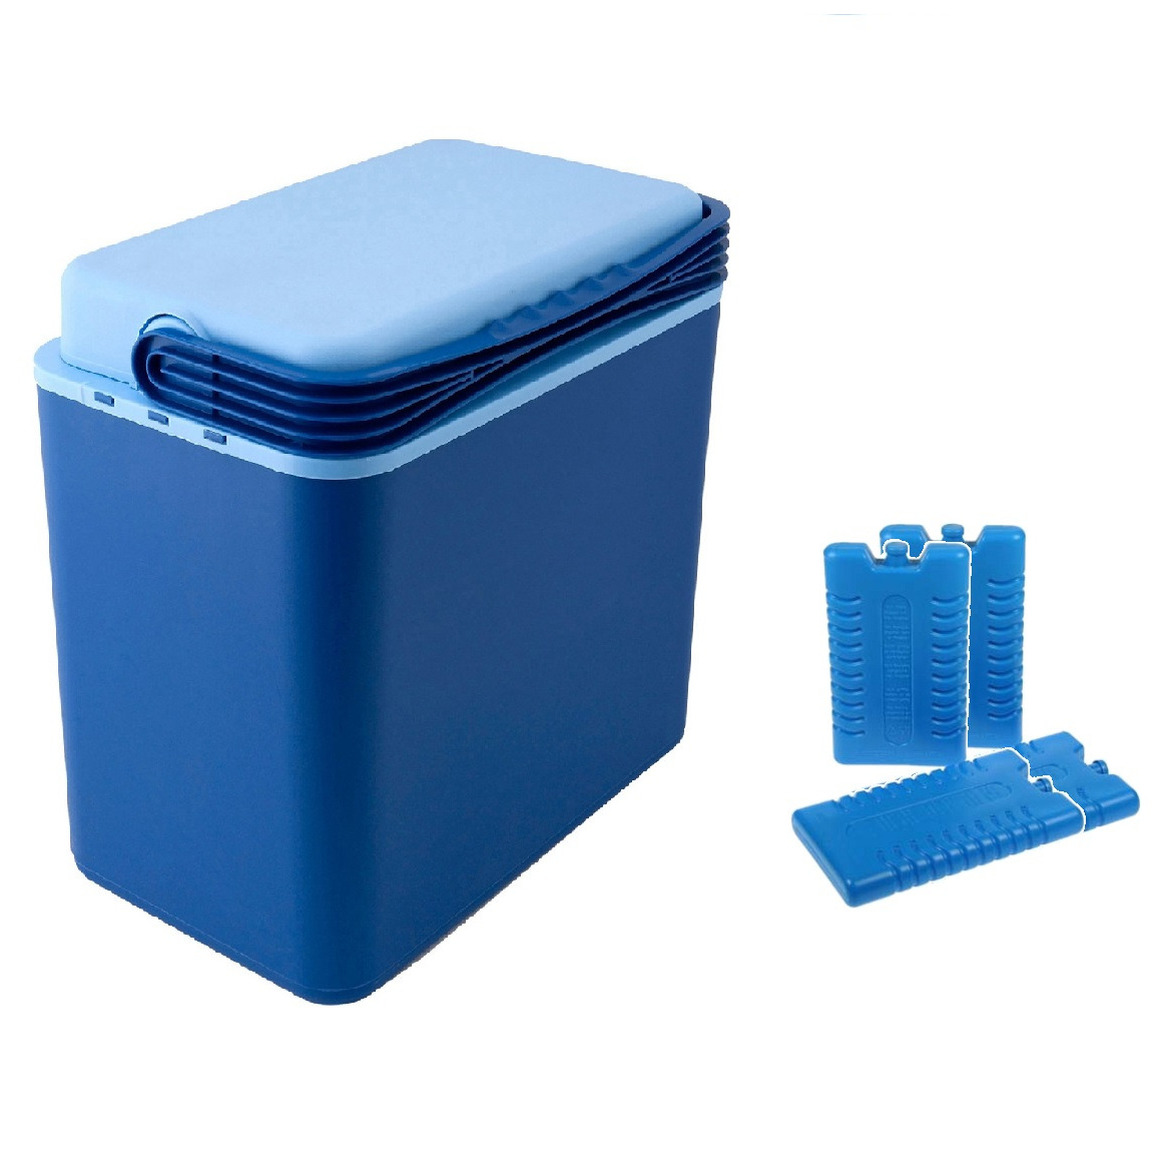 Koelbox donkerblauw 24 liter 39 x 25 x 40 cm incl. 4 koelelementen